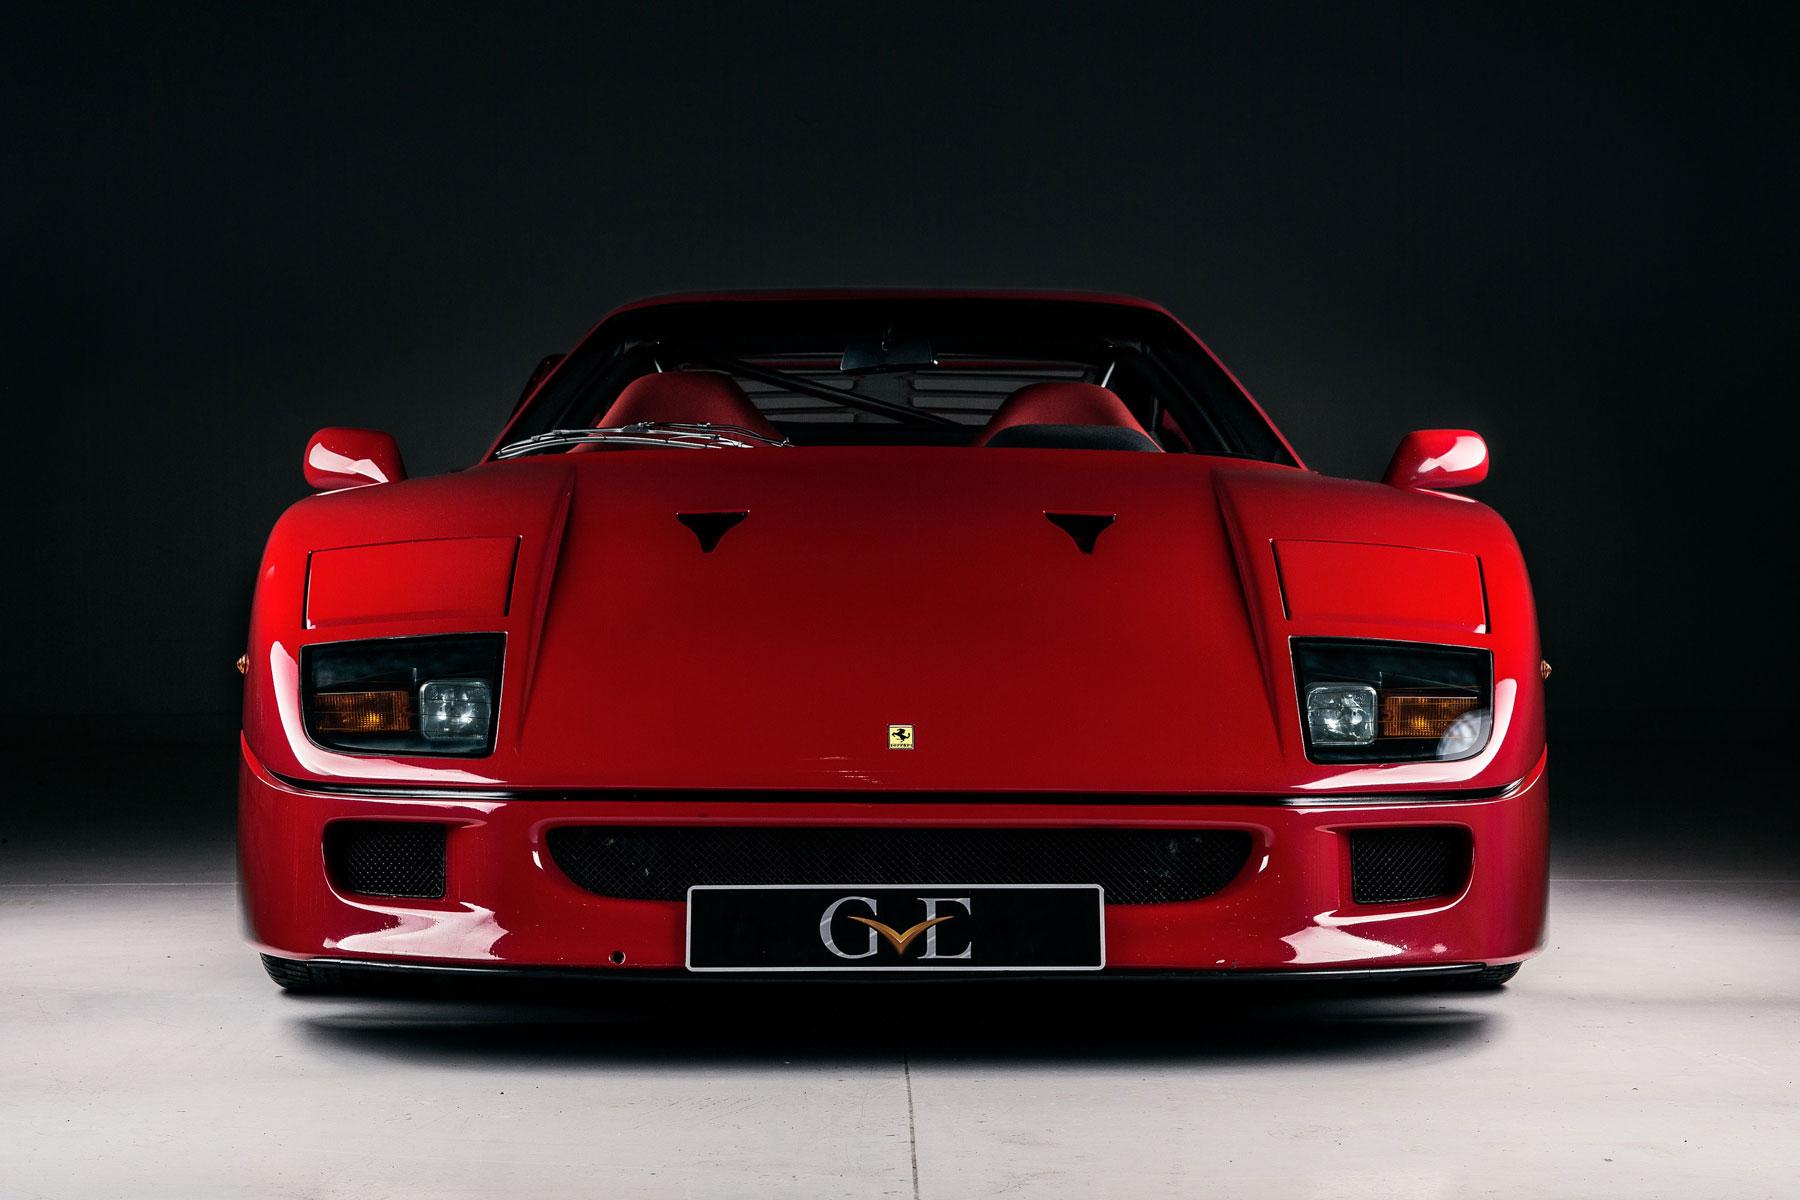 Eric Clapton's Ferrari F40